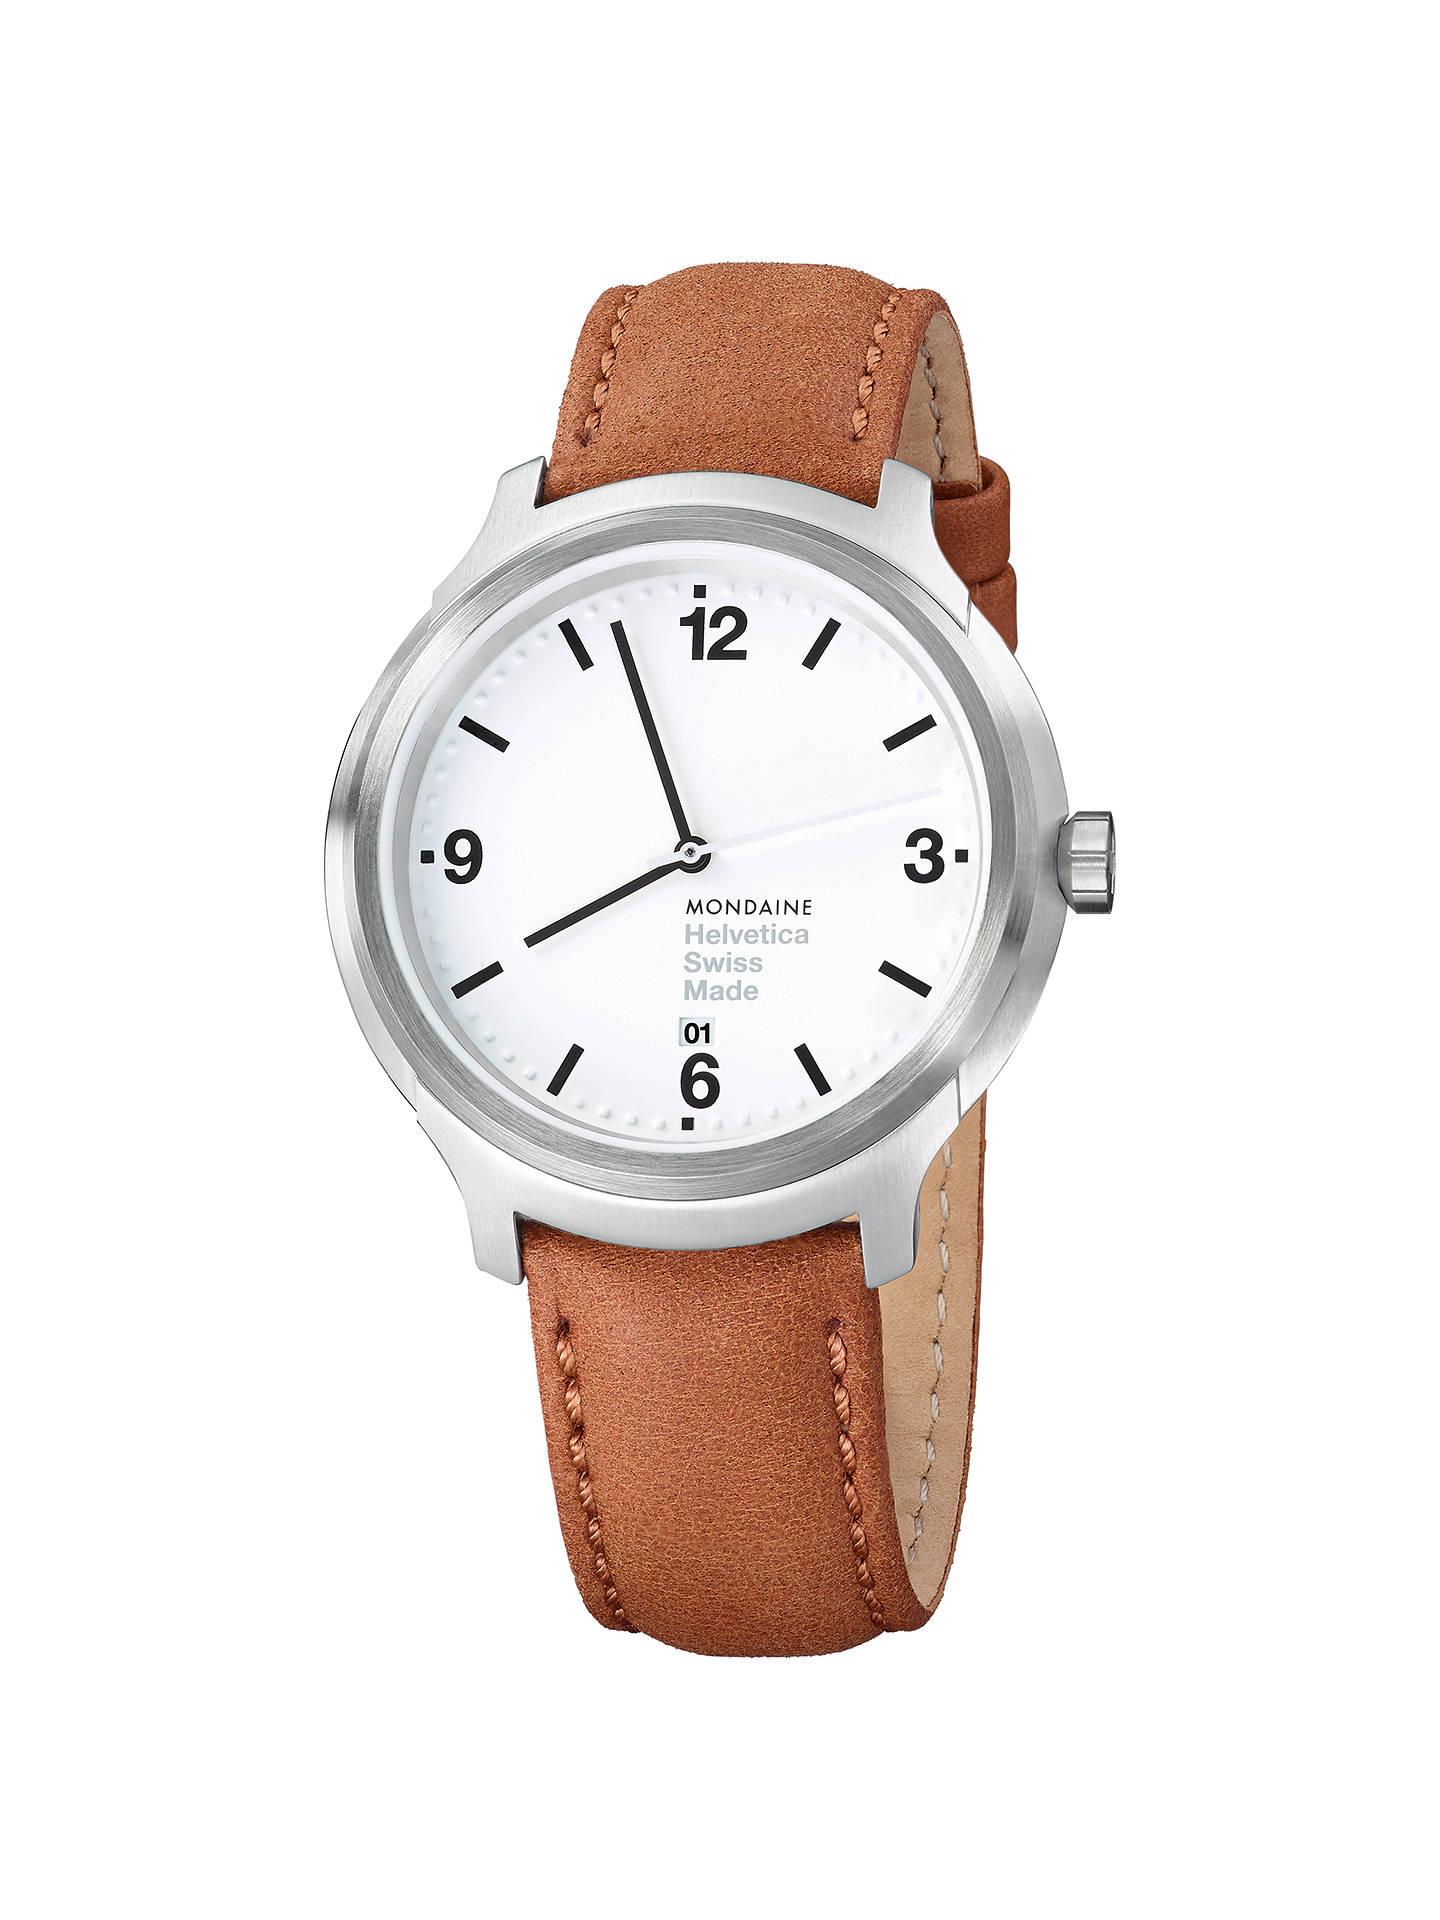 Mondaine MH1B1210LG Unisex Helvetica Leather Strap Watch